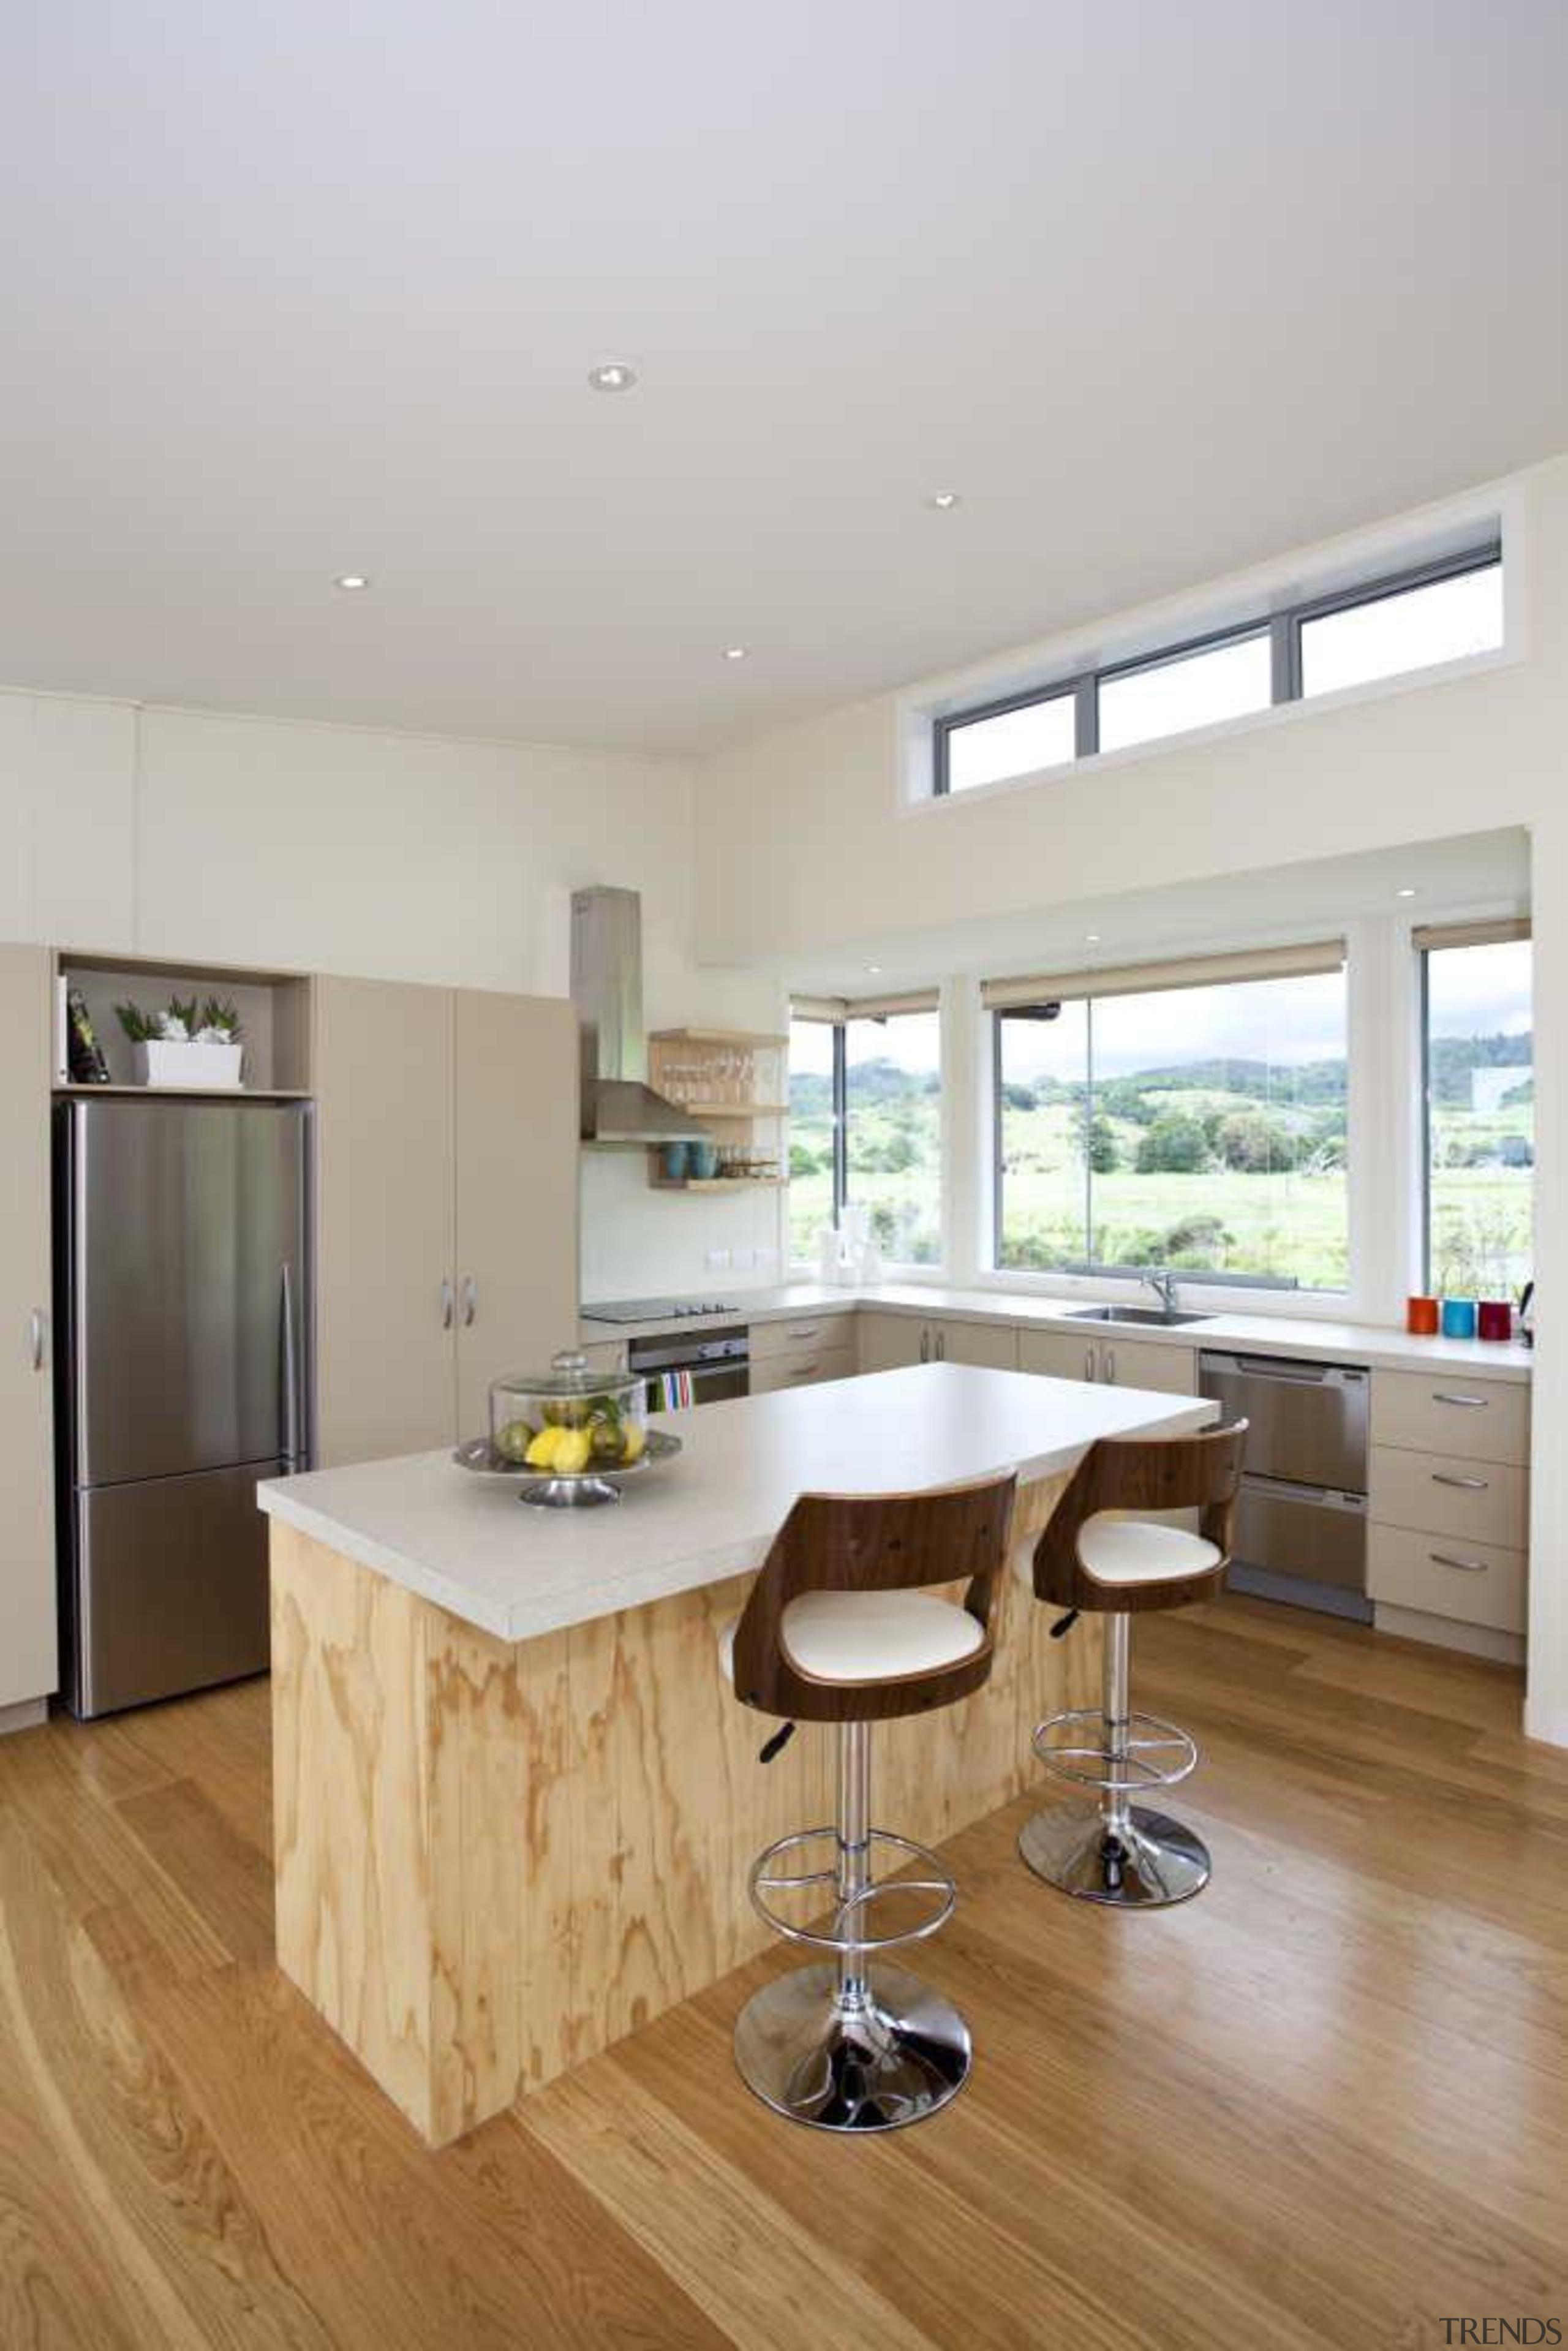 Timber flooring - Kitchen - countertop   floor countertop, floor, flooring, hardwood, interior design, kitchen, laminate flooring, real estate, room, wood flooring, gray